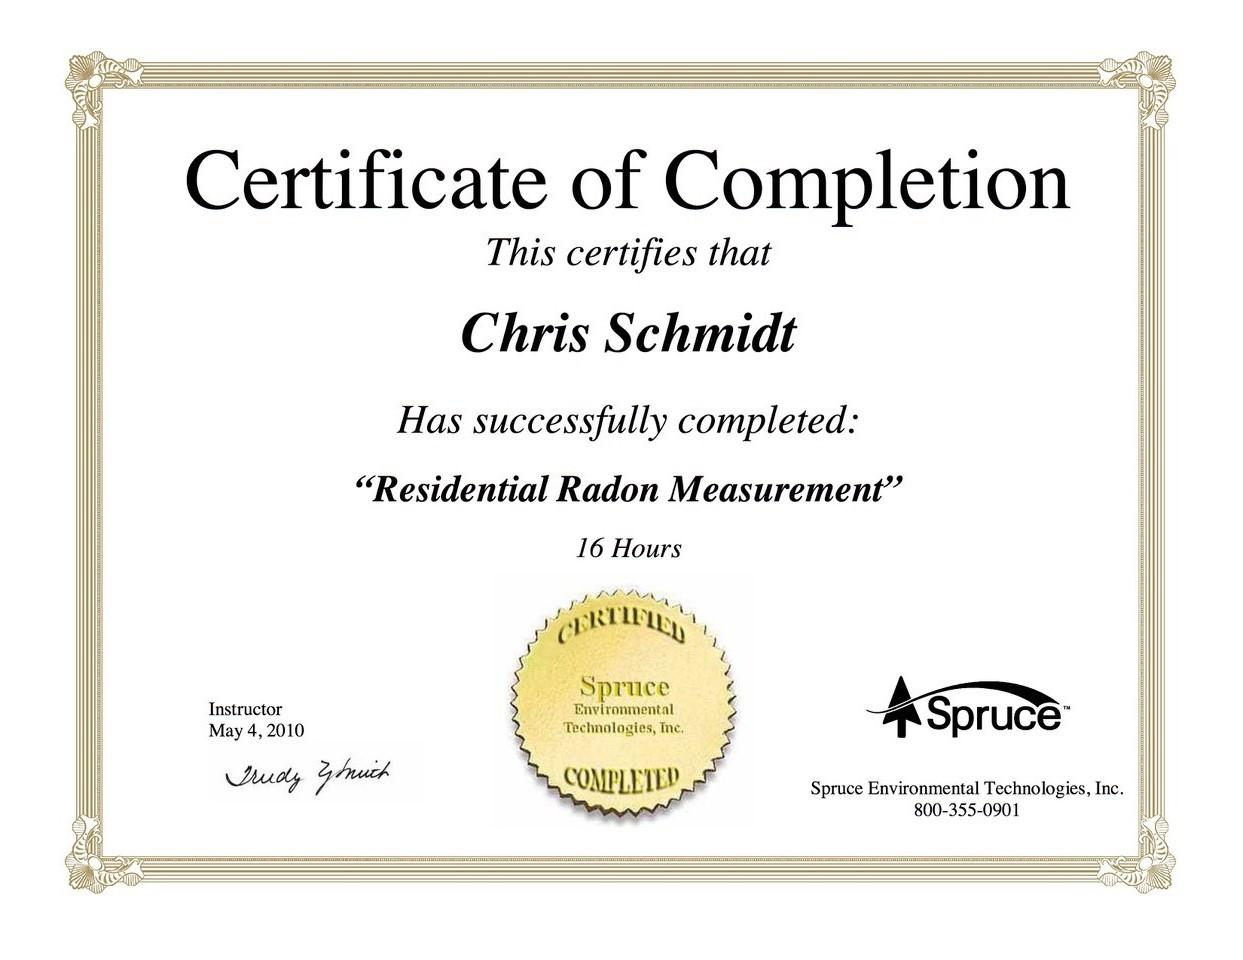 Greater Saanich Radon Testing & Mitigation Certified Experts